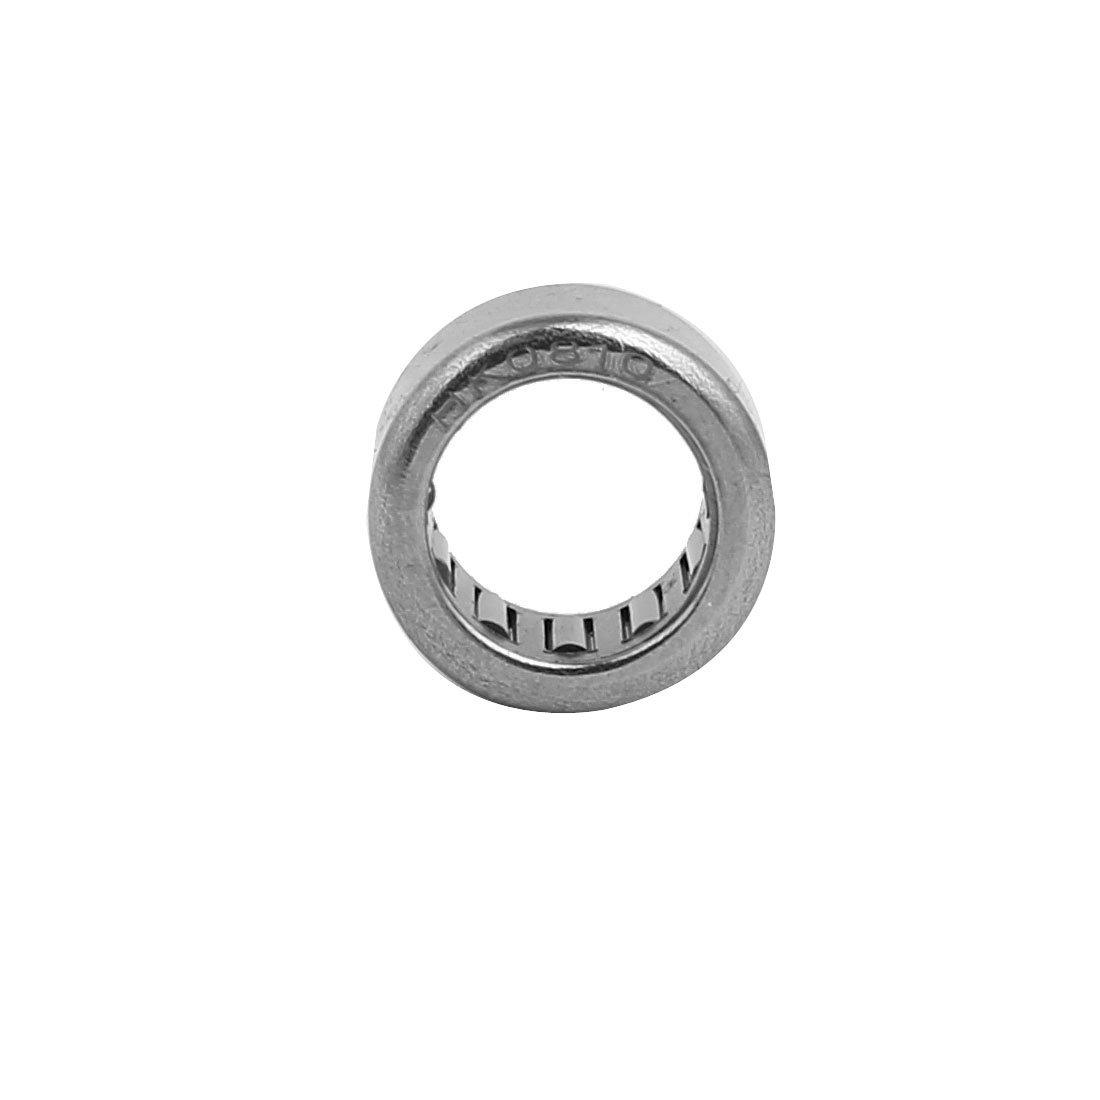 HK0810 Vollrolliges Metrisches Drawn Cup Nadel Roller Lager 8mmx12mmx10mm sourcing map 10stk